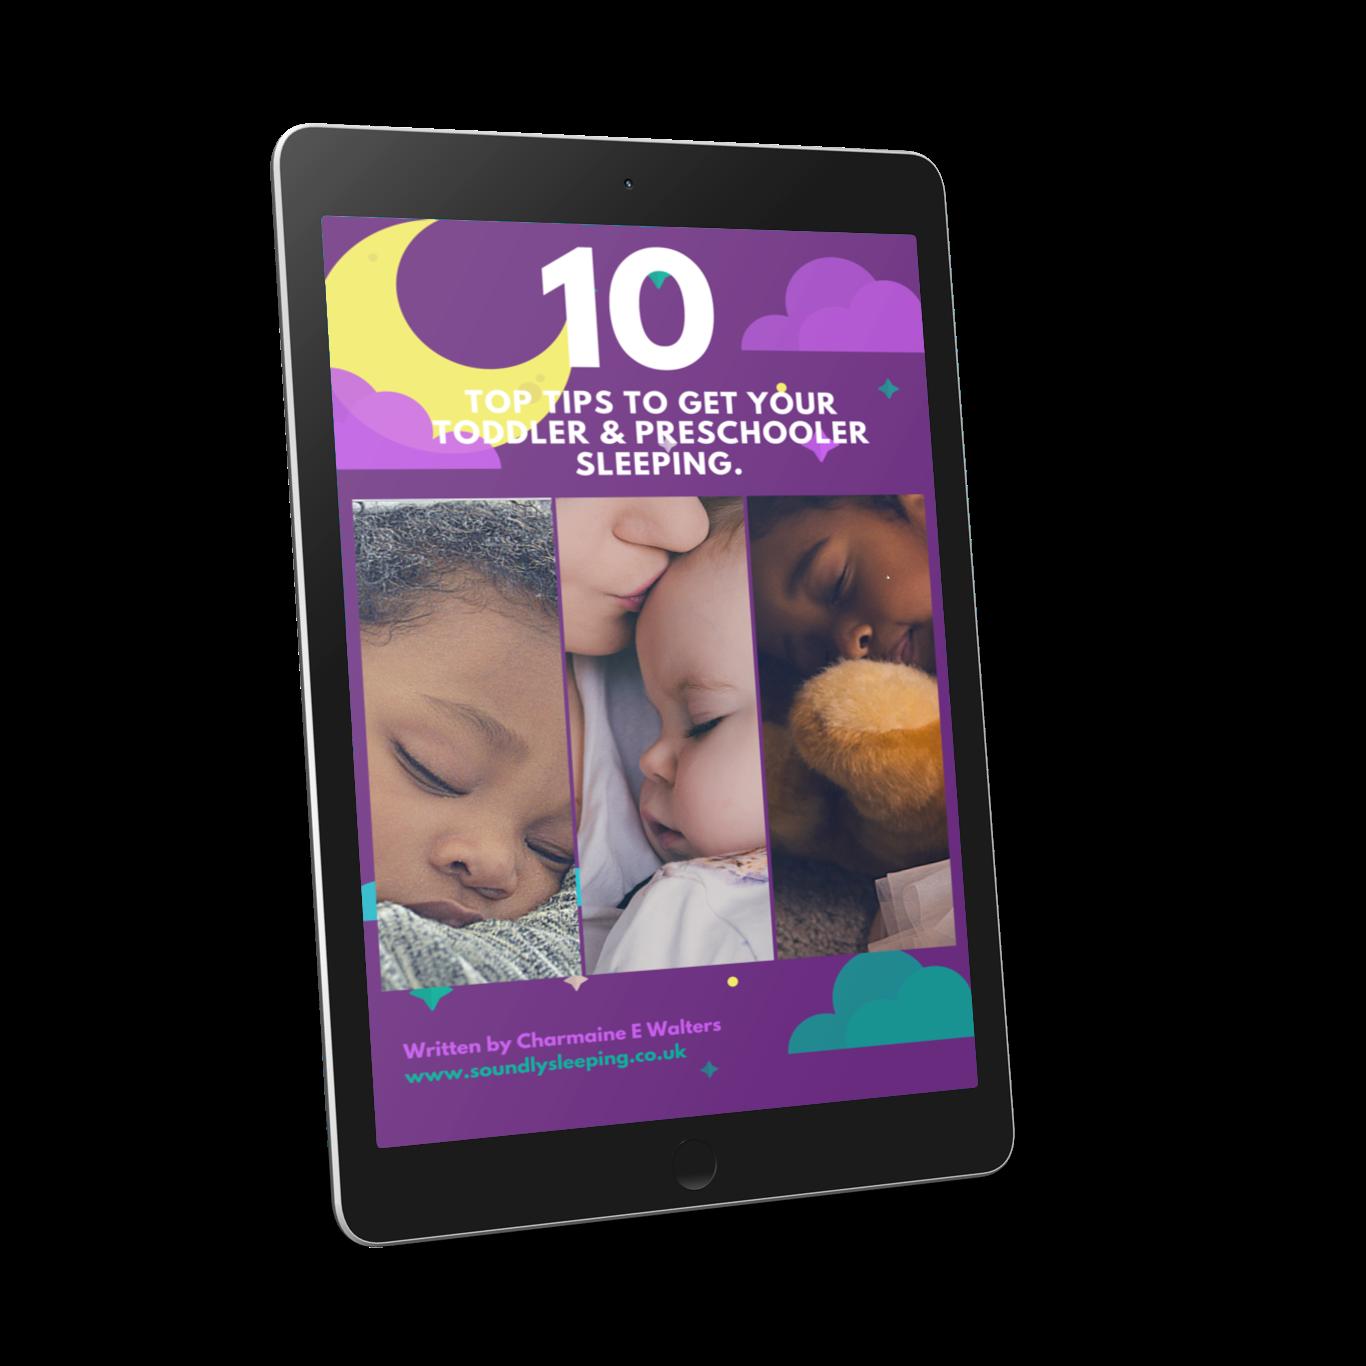 10 Top Tips Toddler eBook (Freebie)